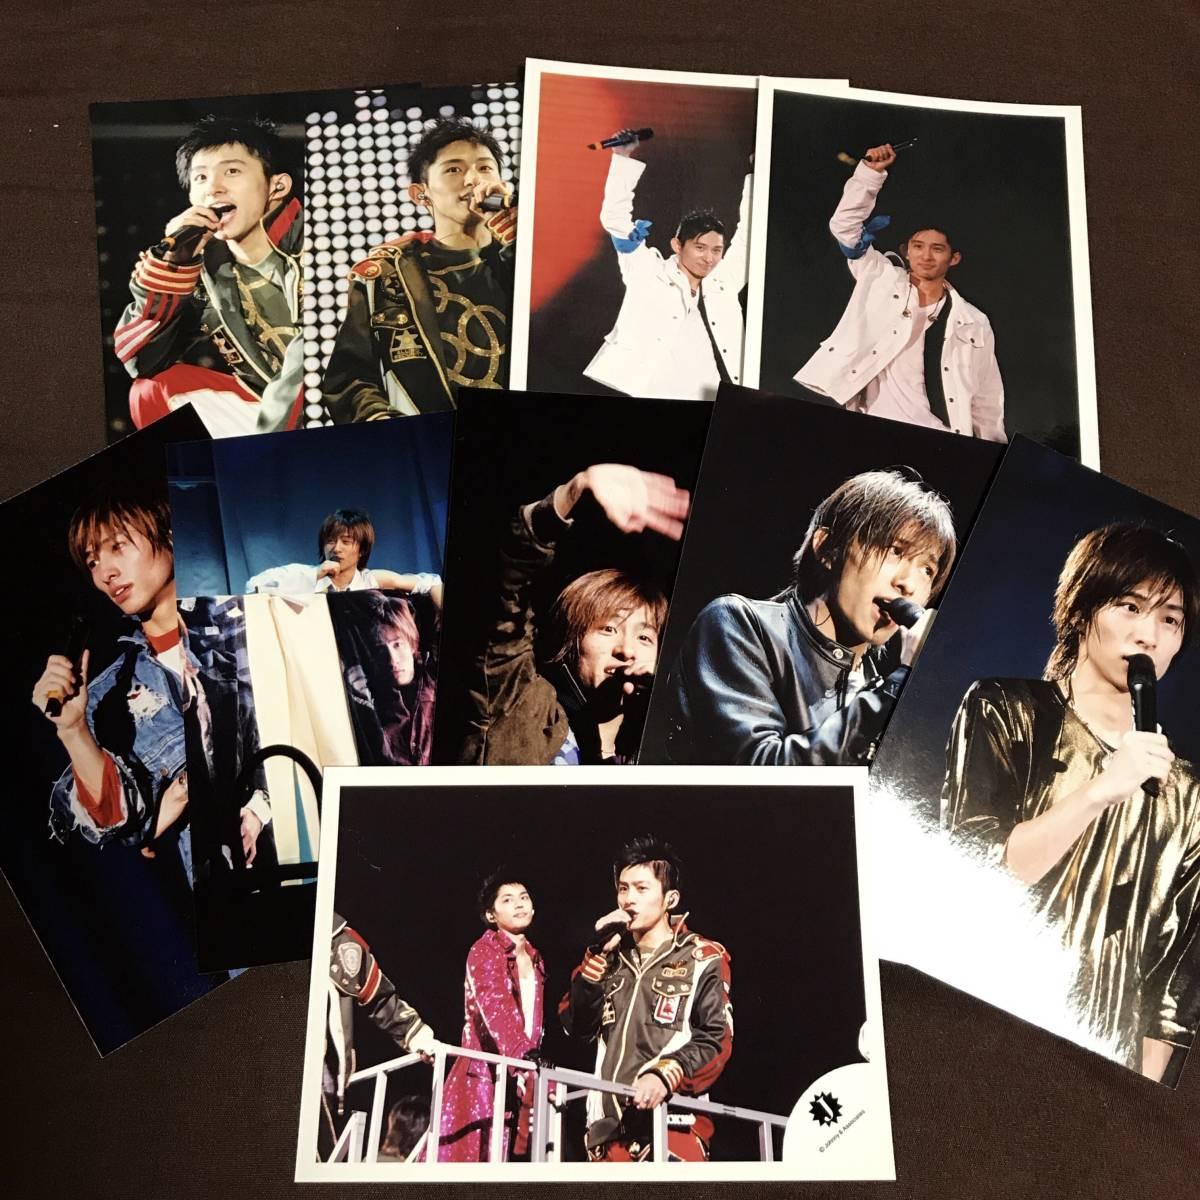 V6 三宅健 公式写真 写真 ブロマイド グッズ ④ コンサートグッズの画像